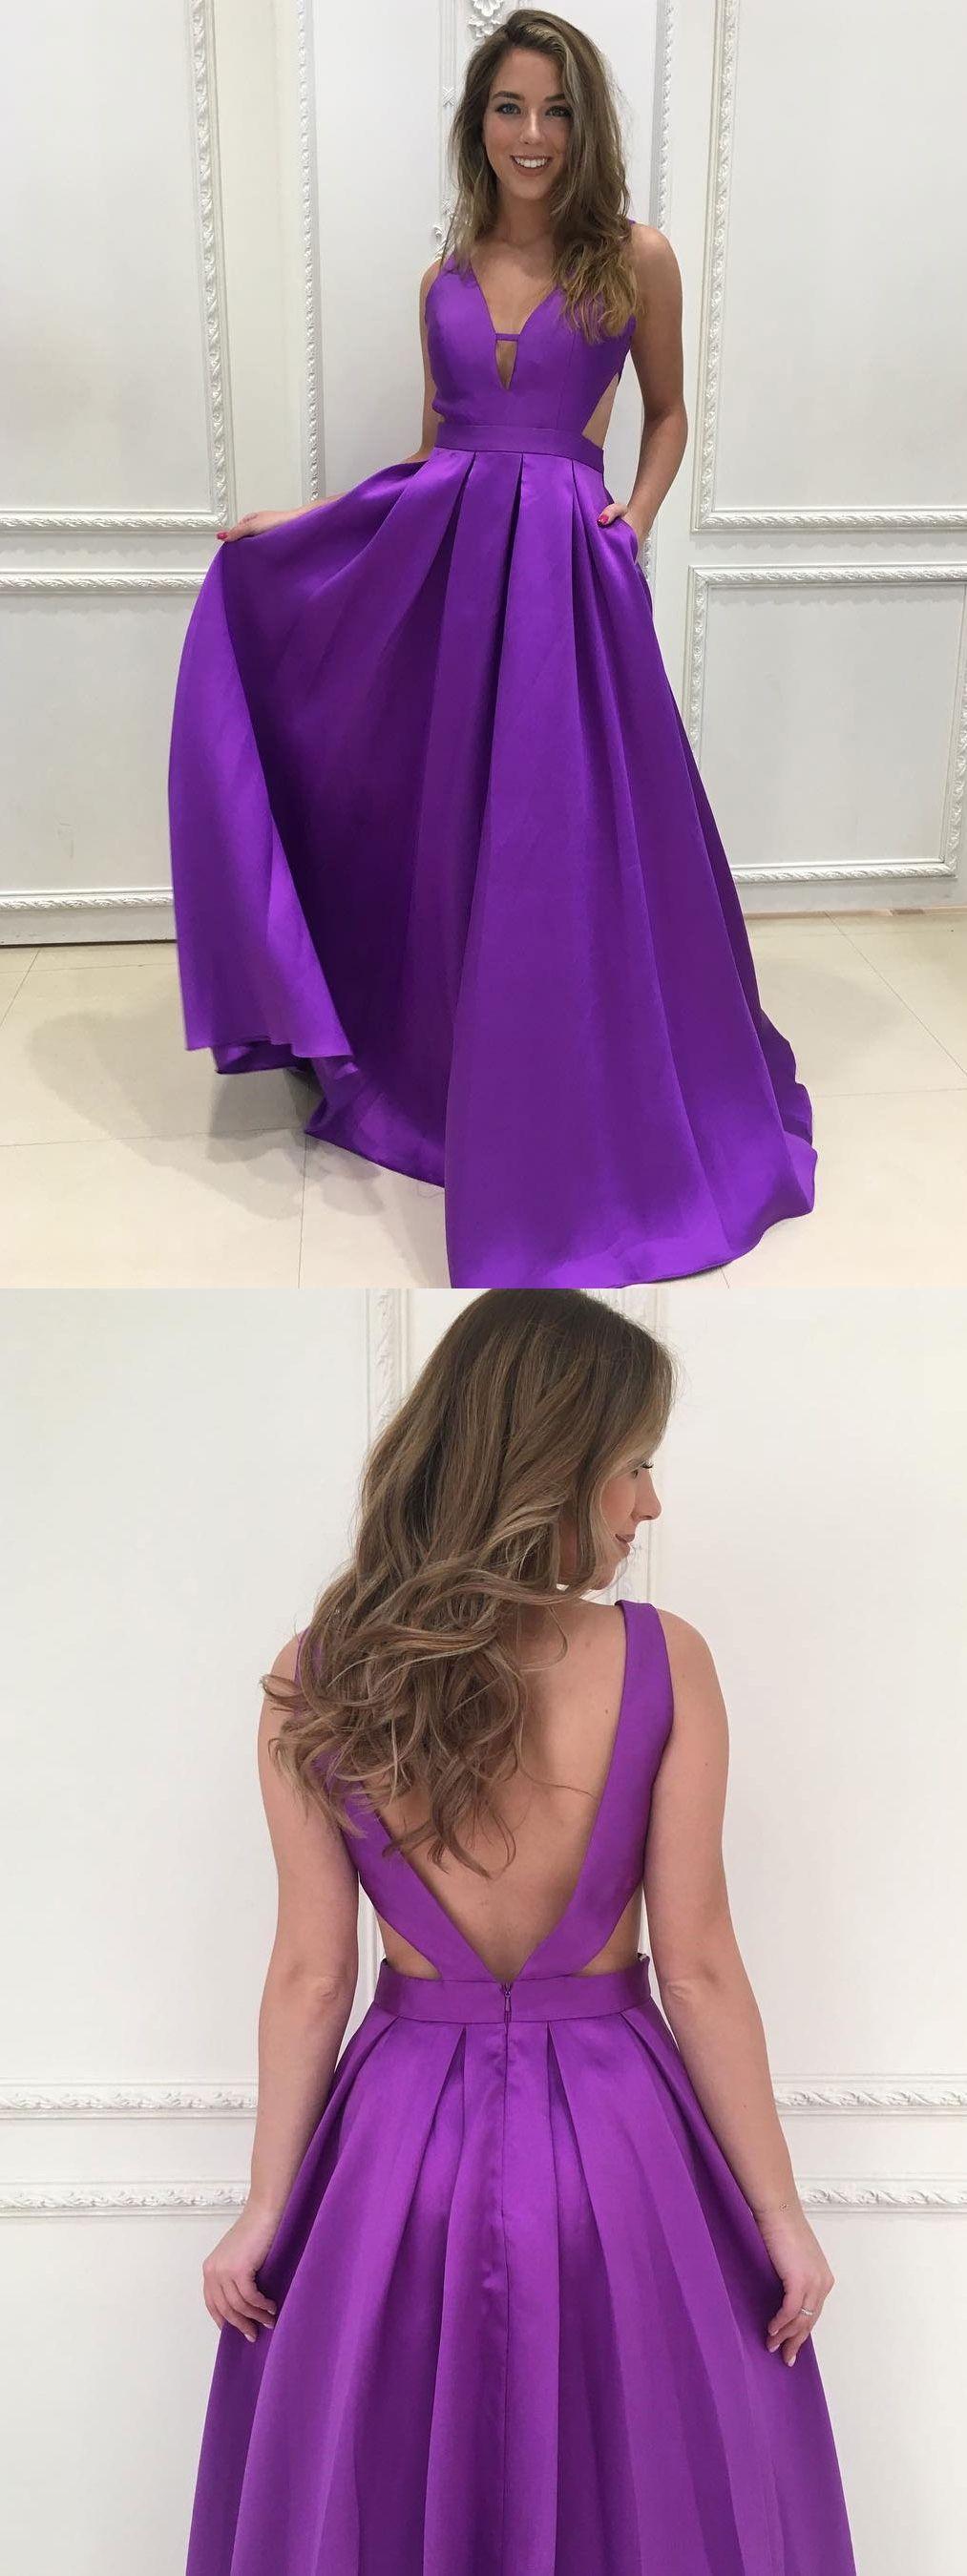 Aline vneck satin long simple prom dresses purple bridesmaid